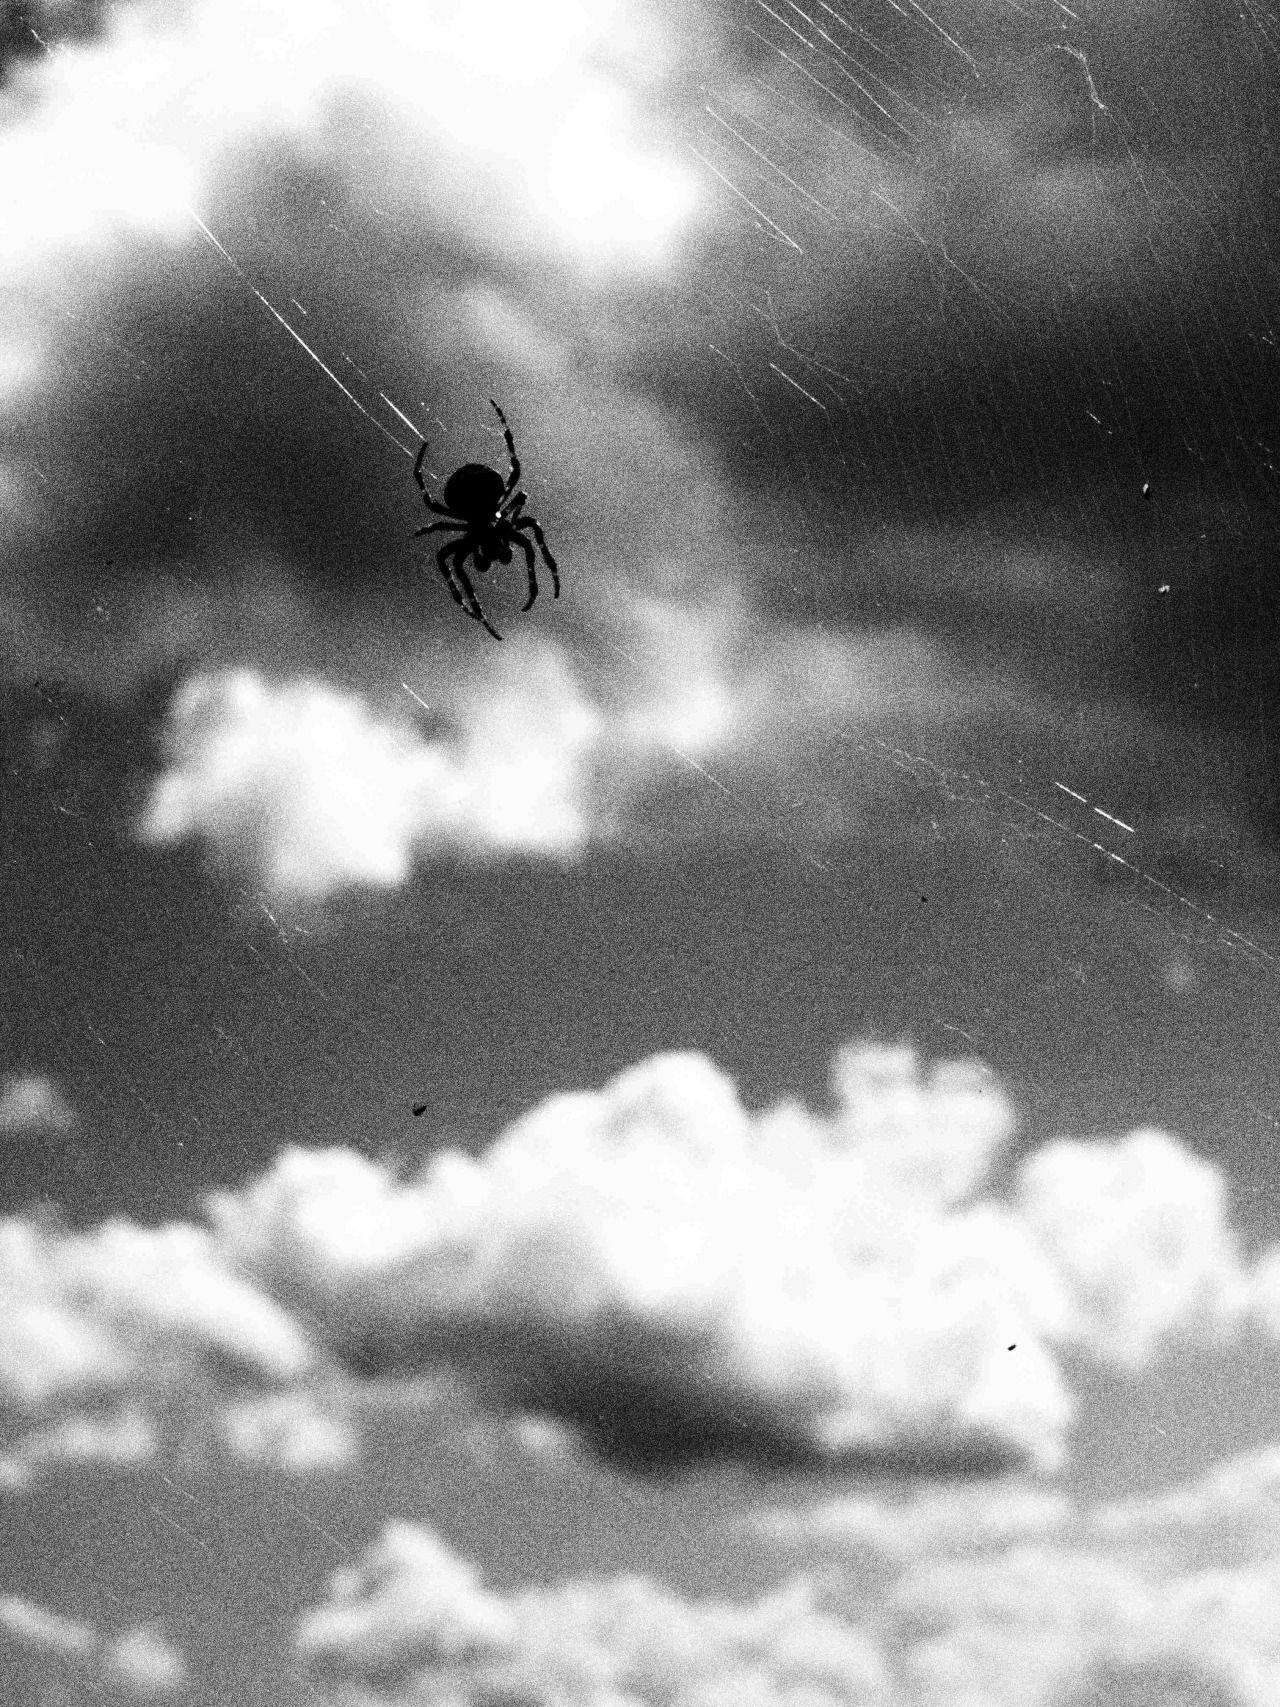 "jiji-de-jiji: "" 雲と蜘蛛 Clouds and Spider © jiji "" jiji-de-jiji Kumo to kumo 雲と蜘蛛 (Clouds and spider) - Japan - 2016 © jiji"